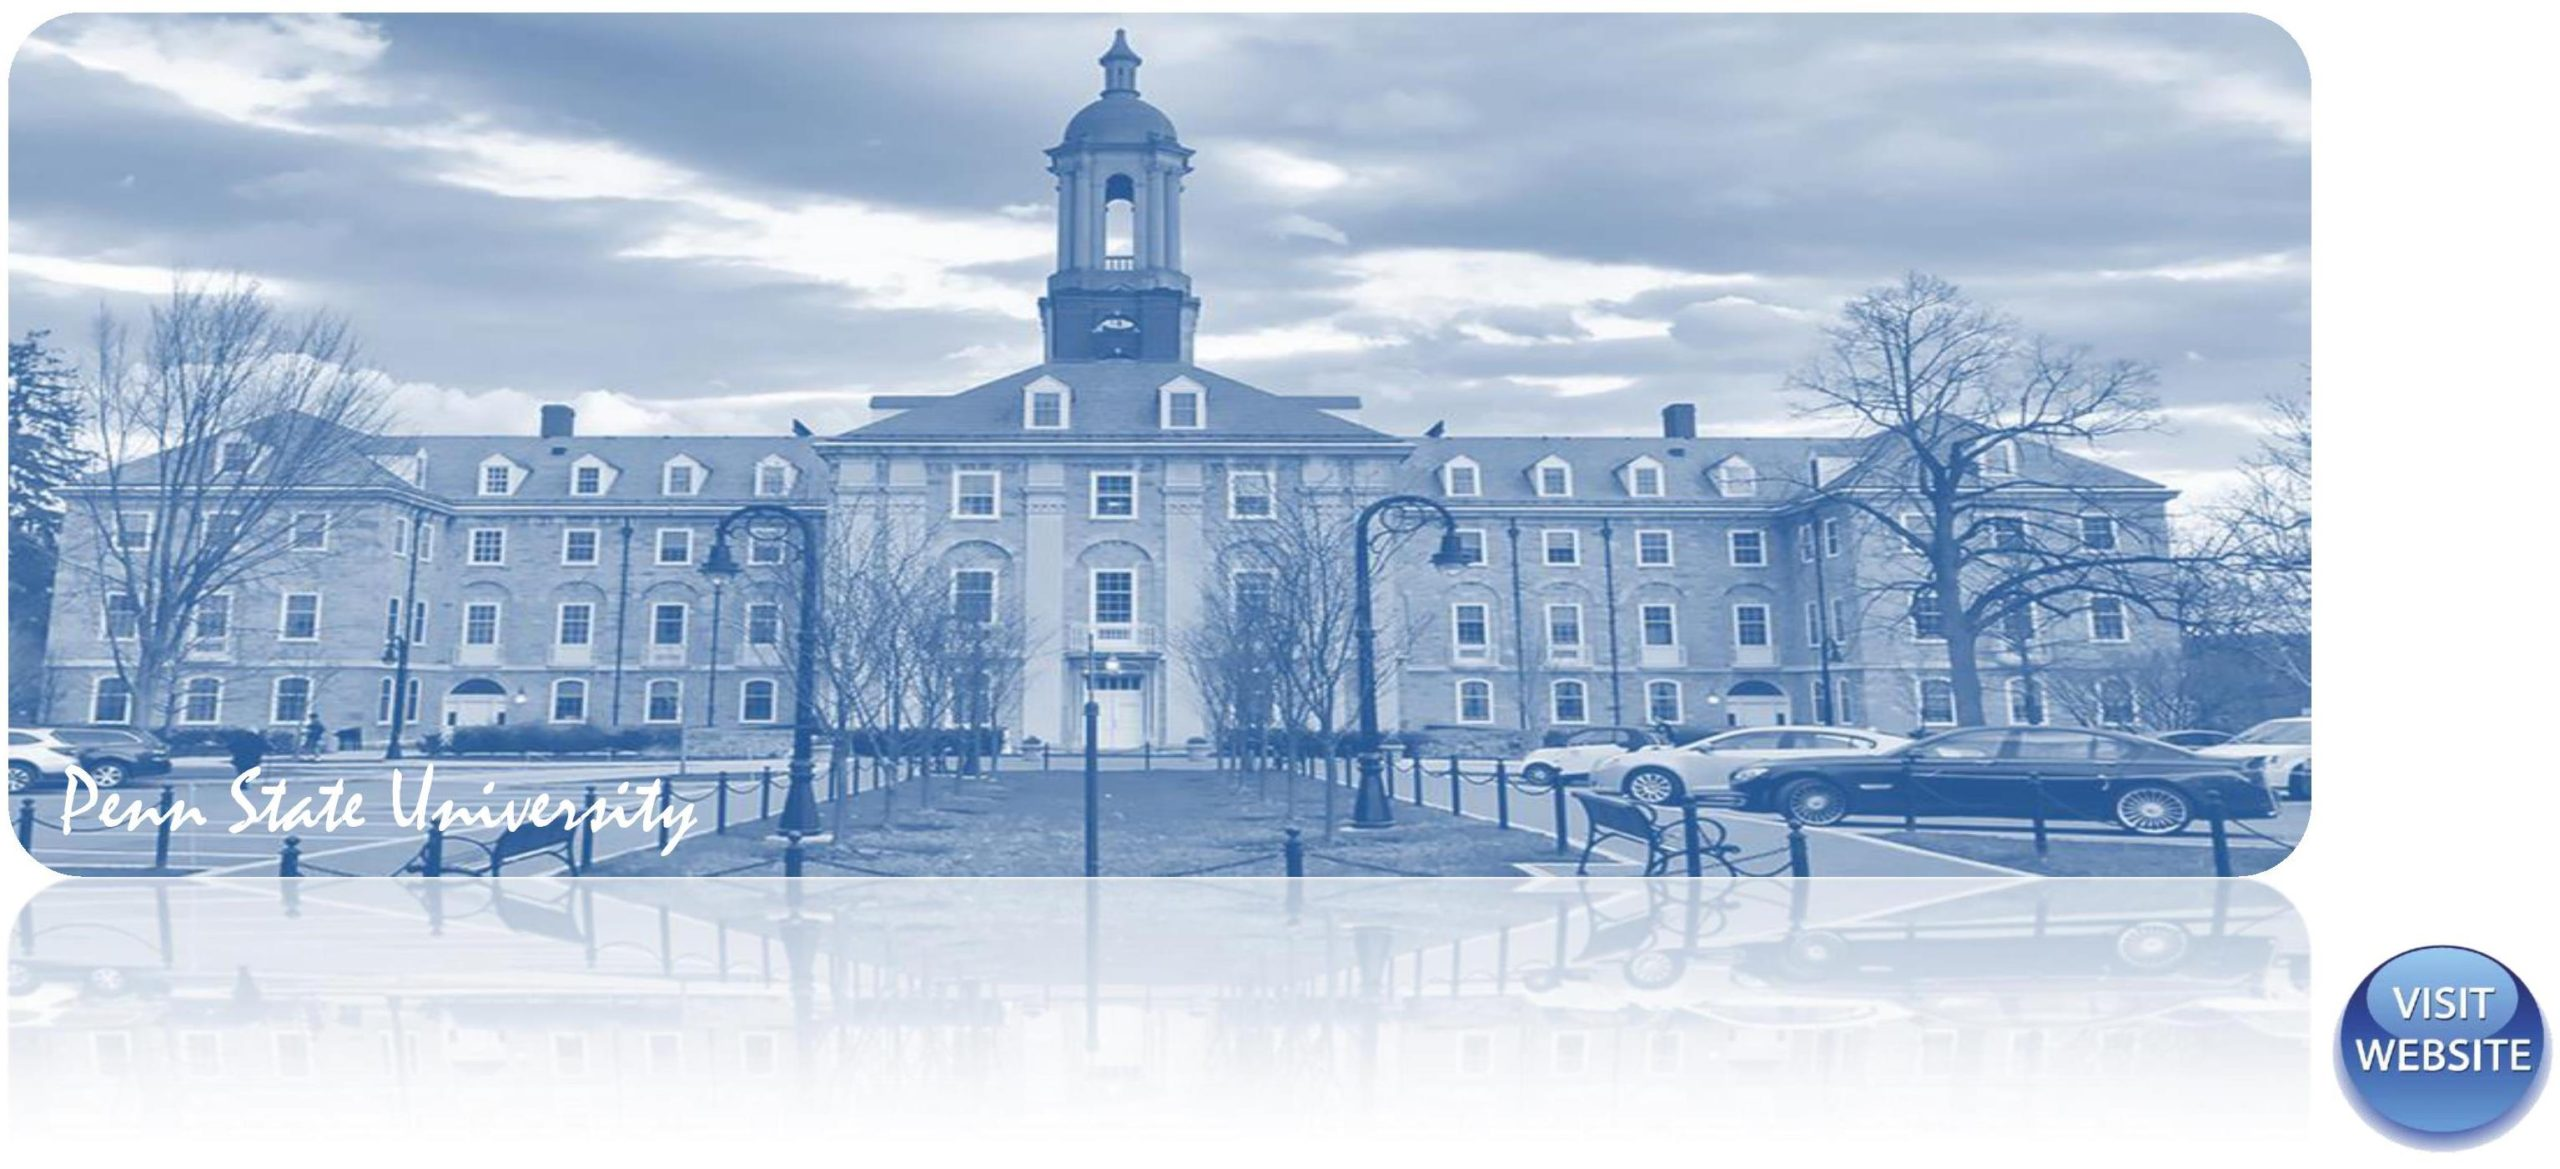 Penn State University USA